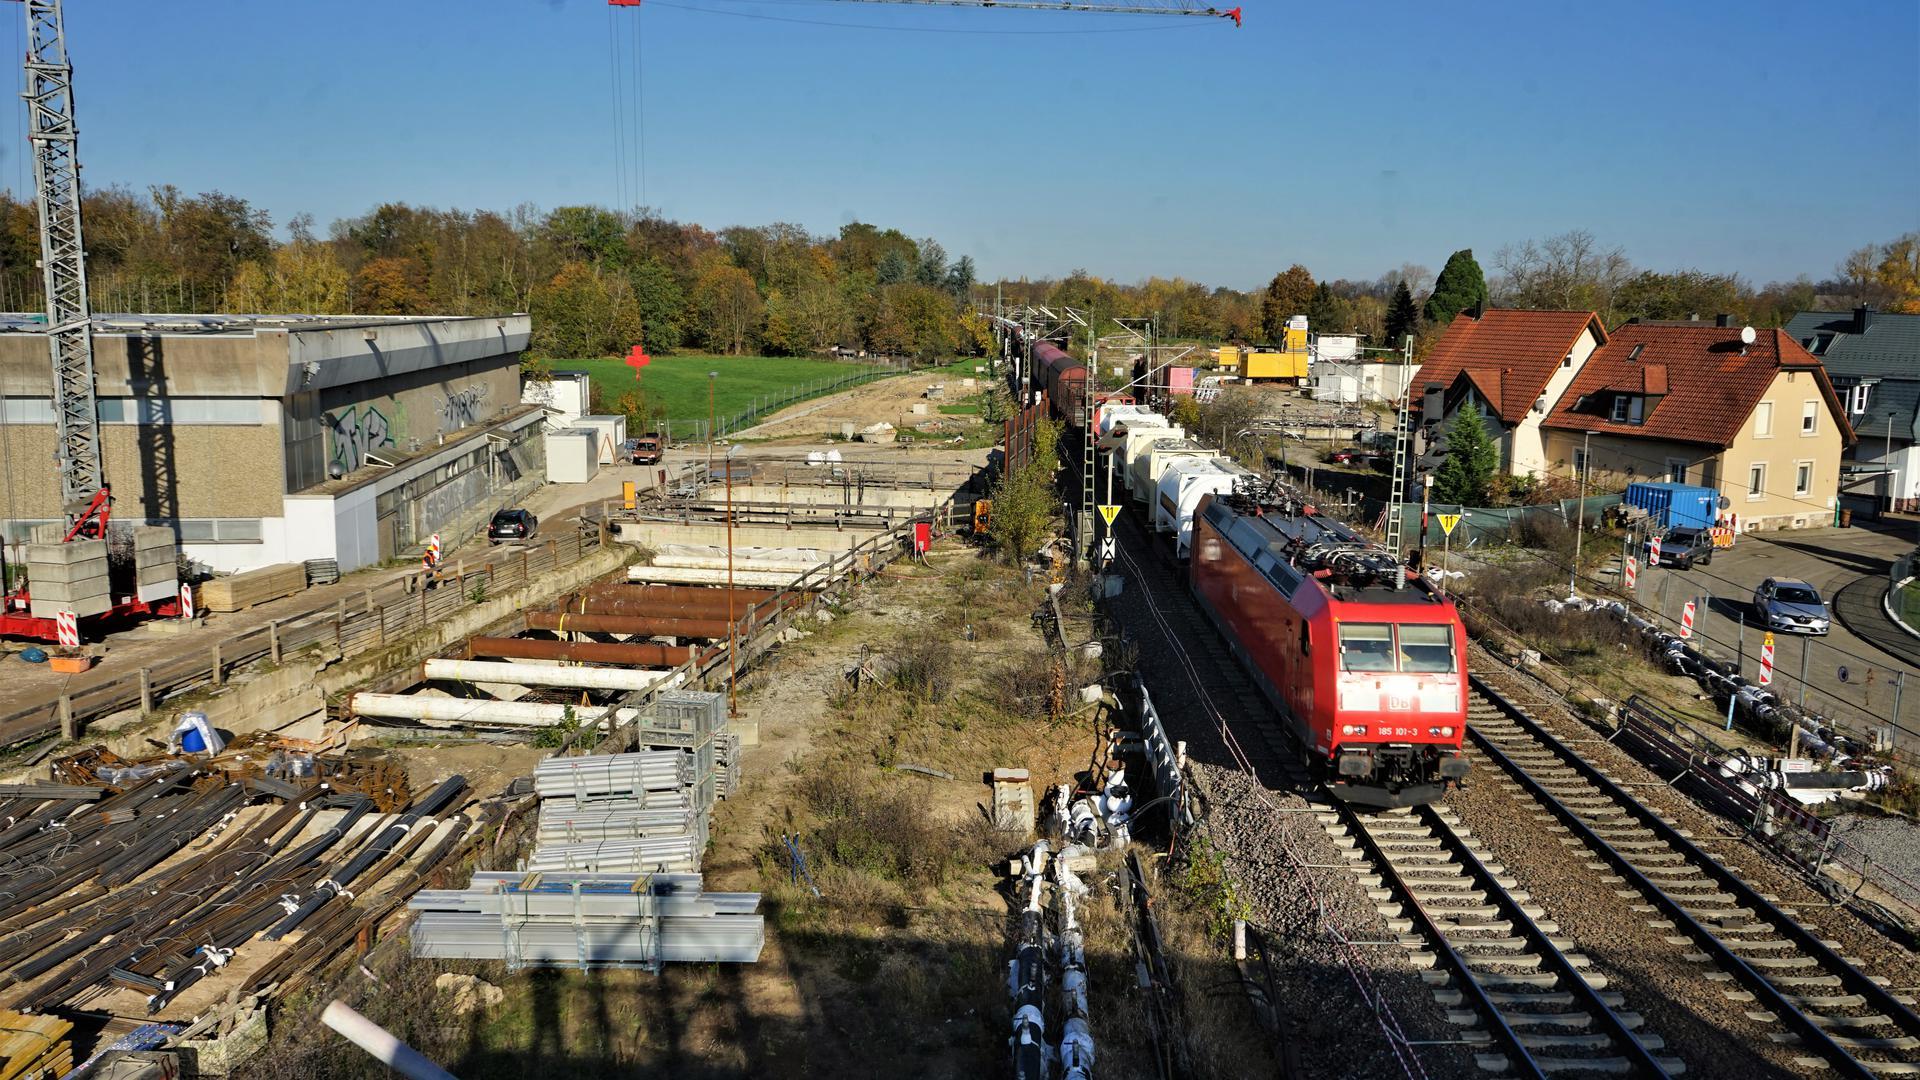 Baustelle an der Rheintalbahn - Tunnel Rastatt - Niederbühl - Sporthalle - Tunnelhavarie